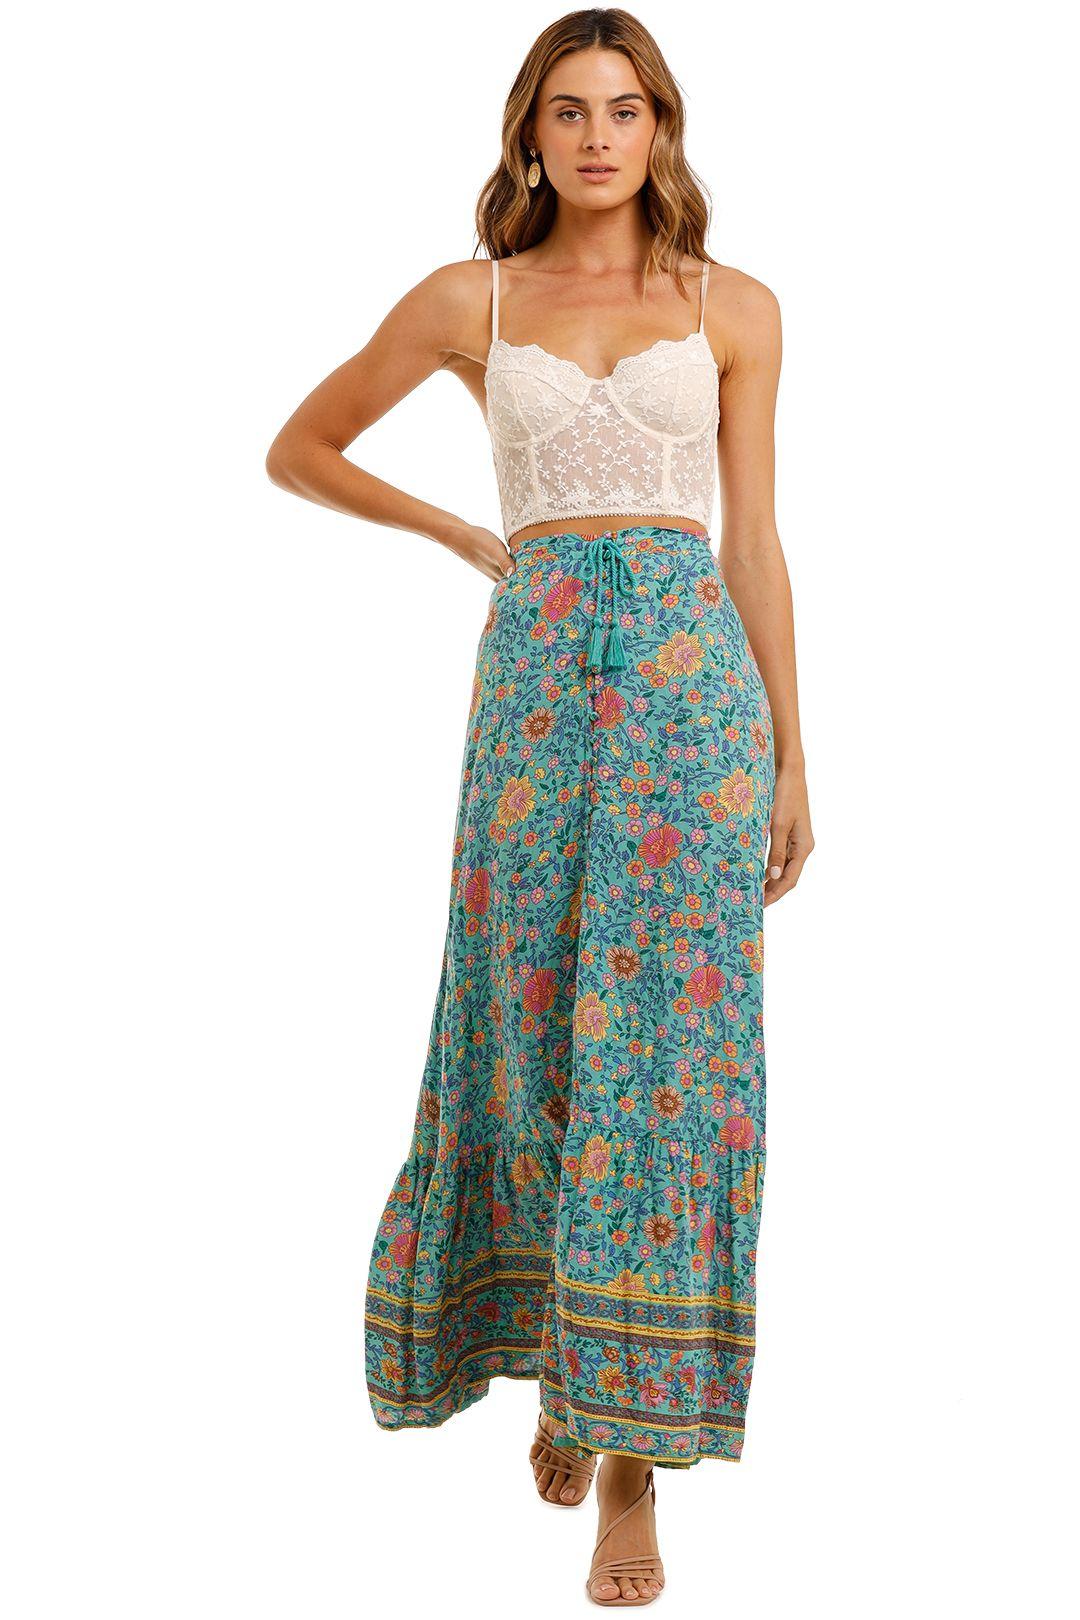 Spell Folk Town Button Down Skirt Turquoise